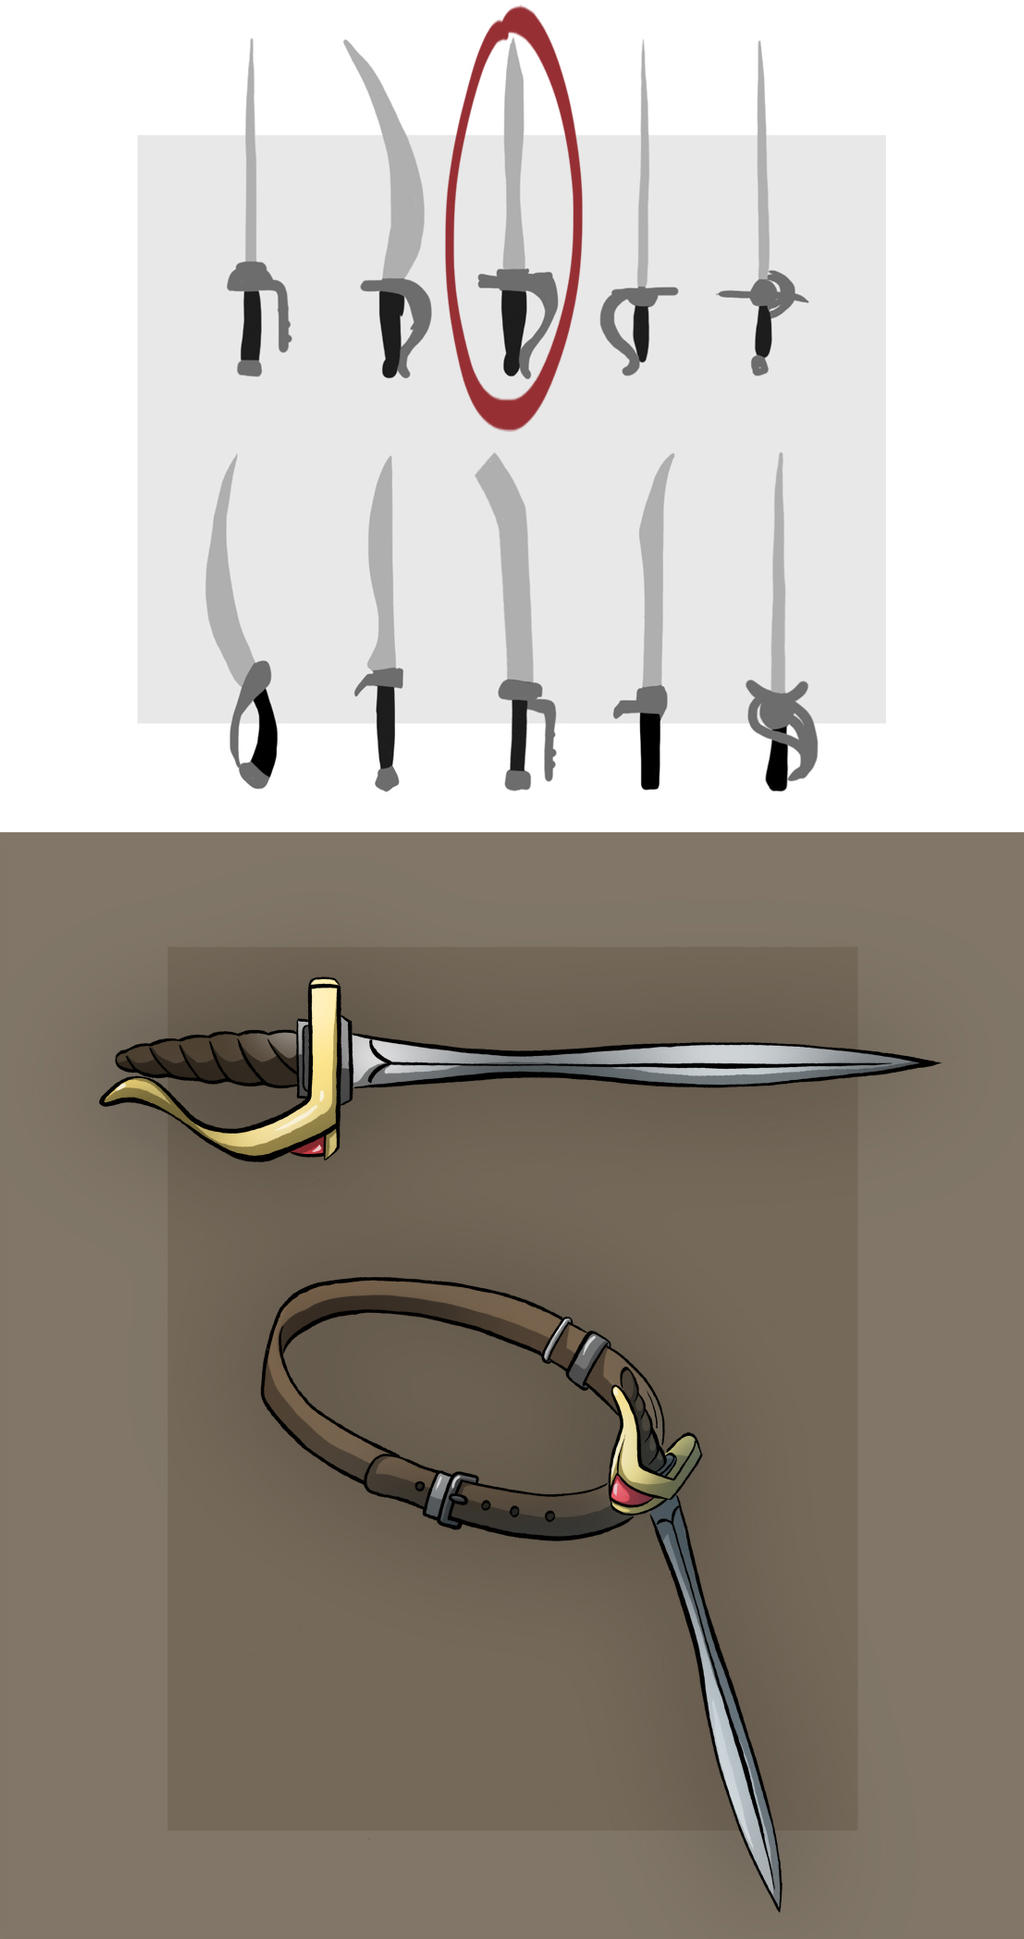 Eva's Sword by Blu-Hue